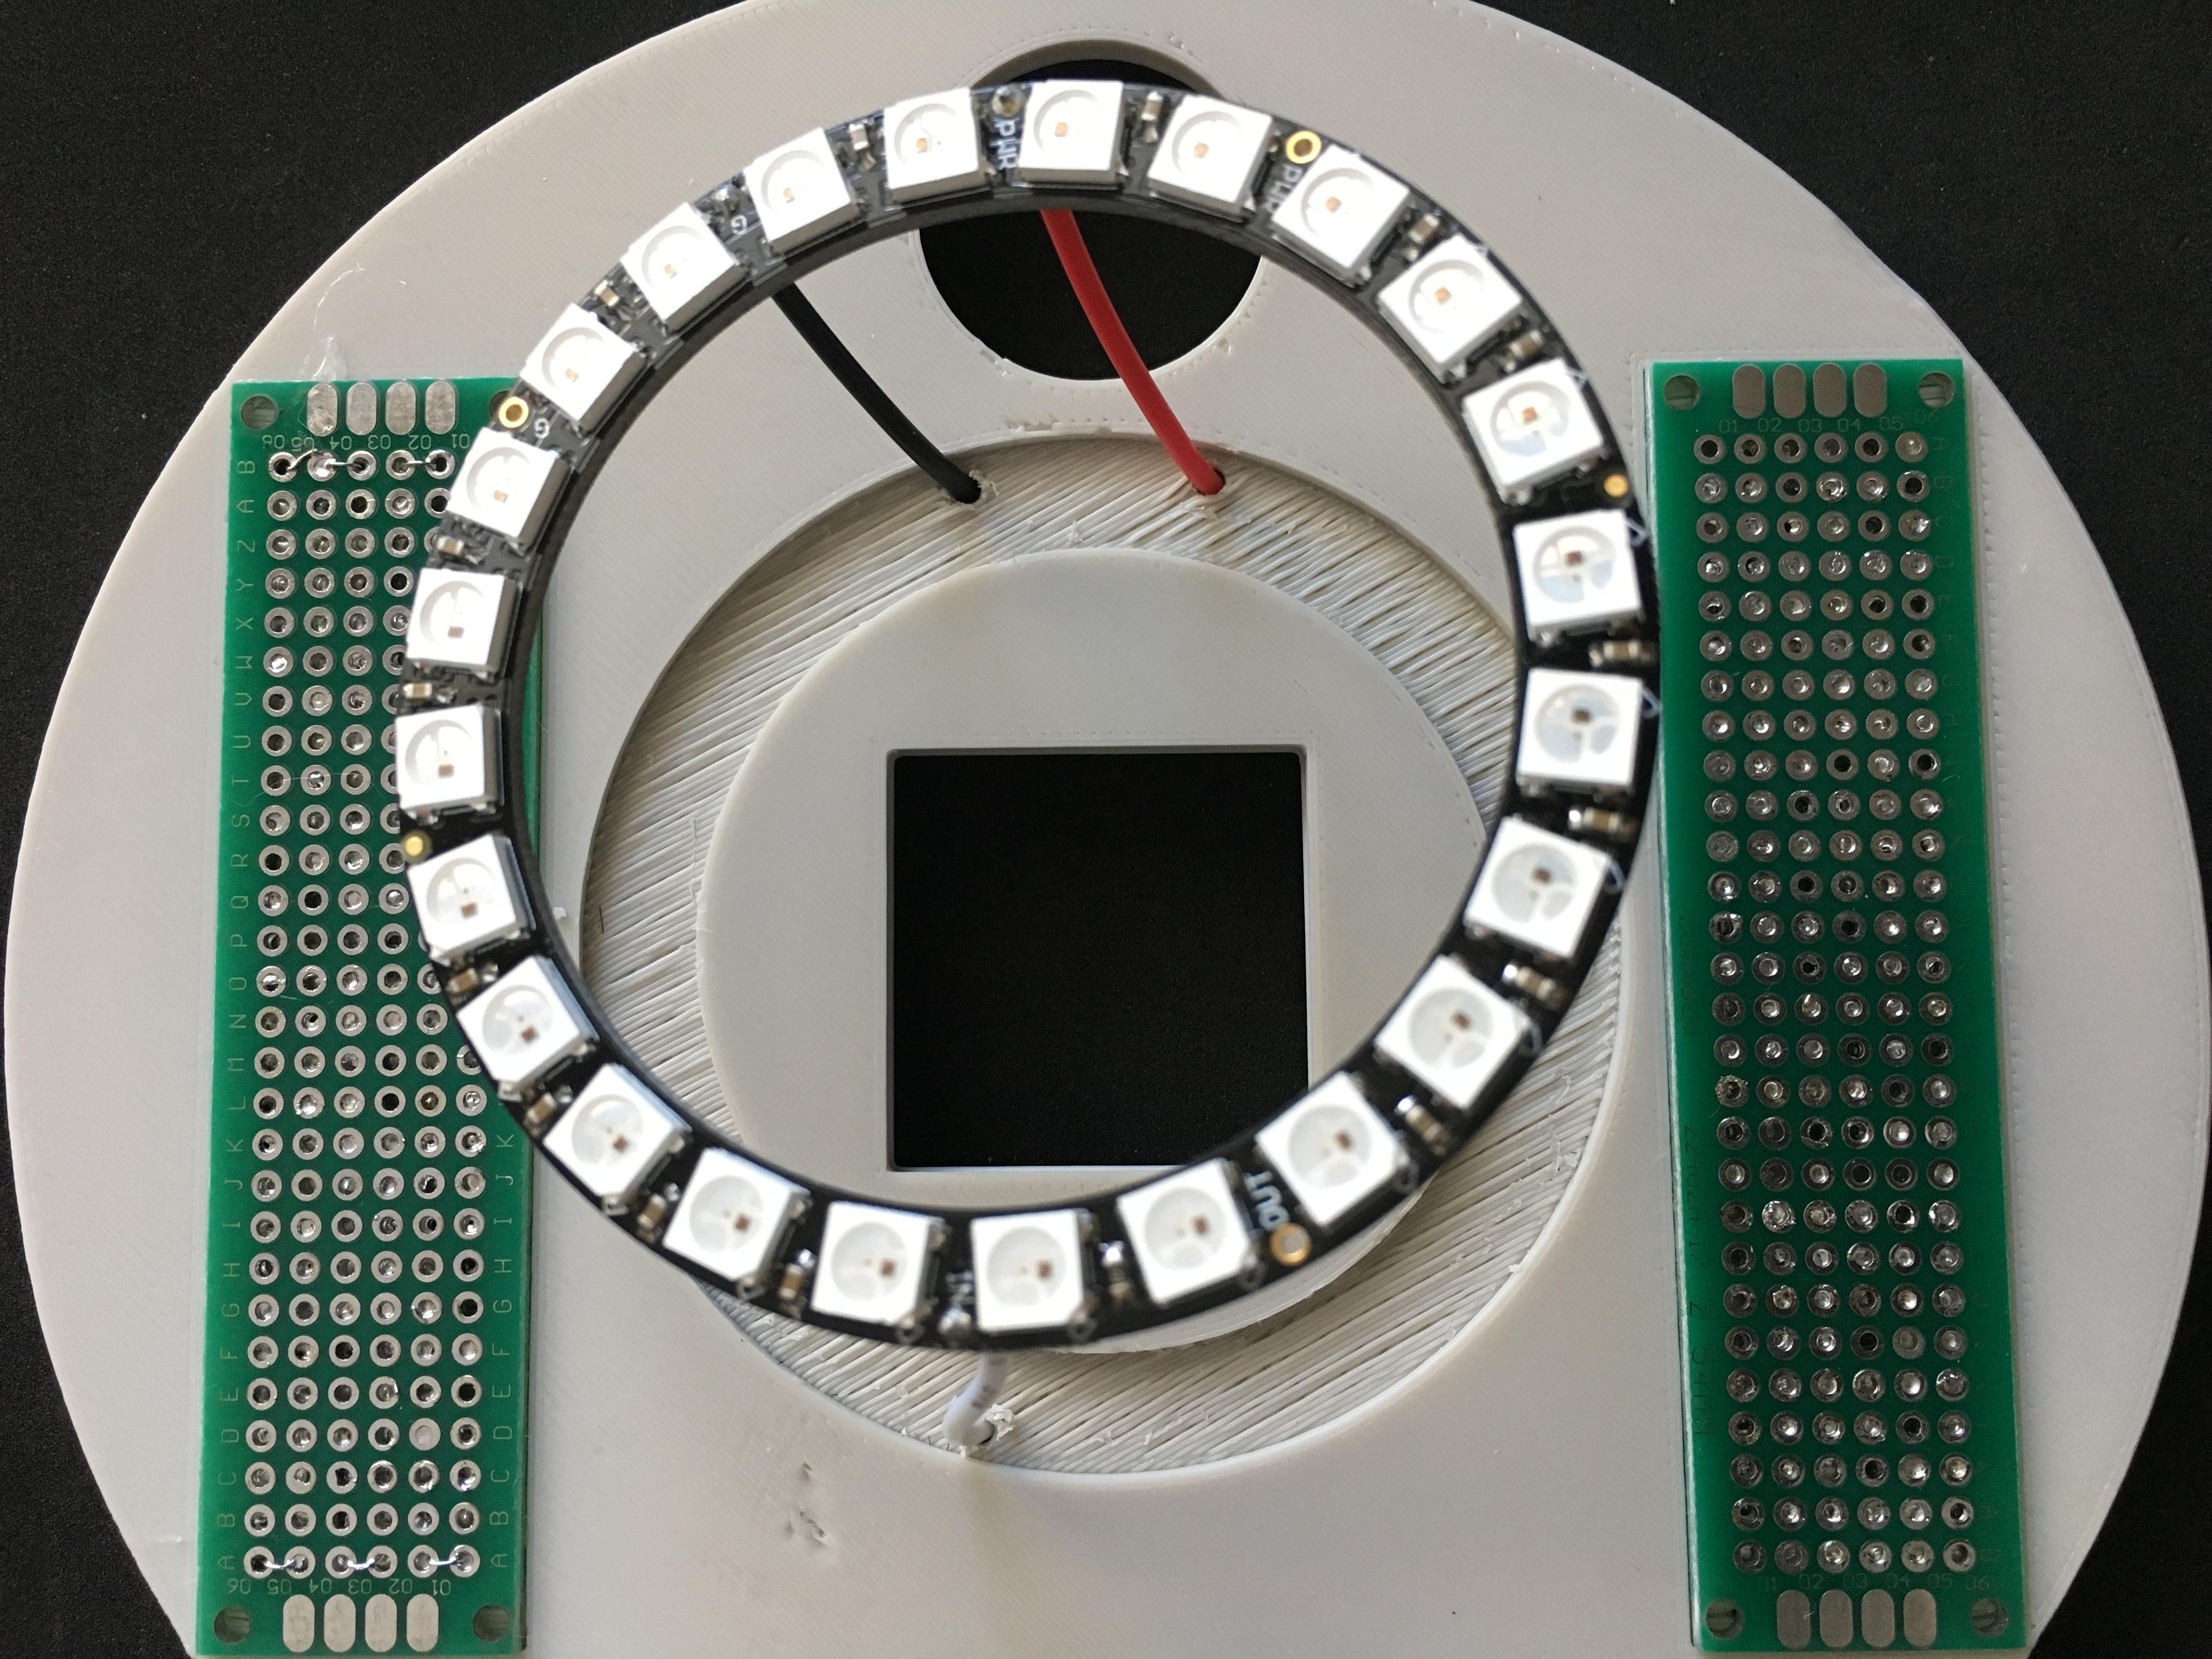 micropython___circuitpython_IMG_2915.jpg